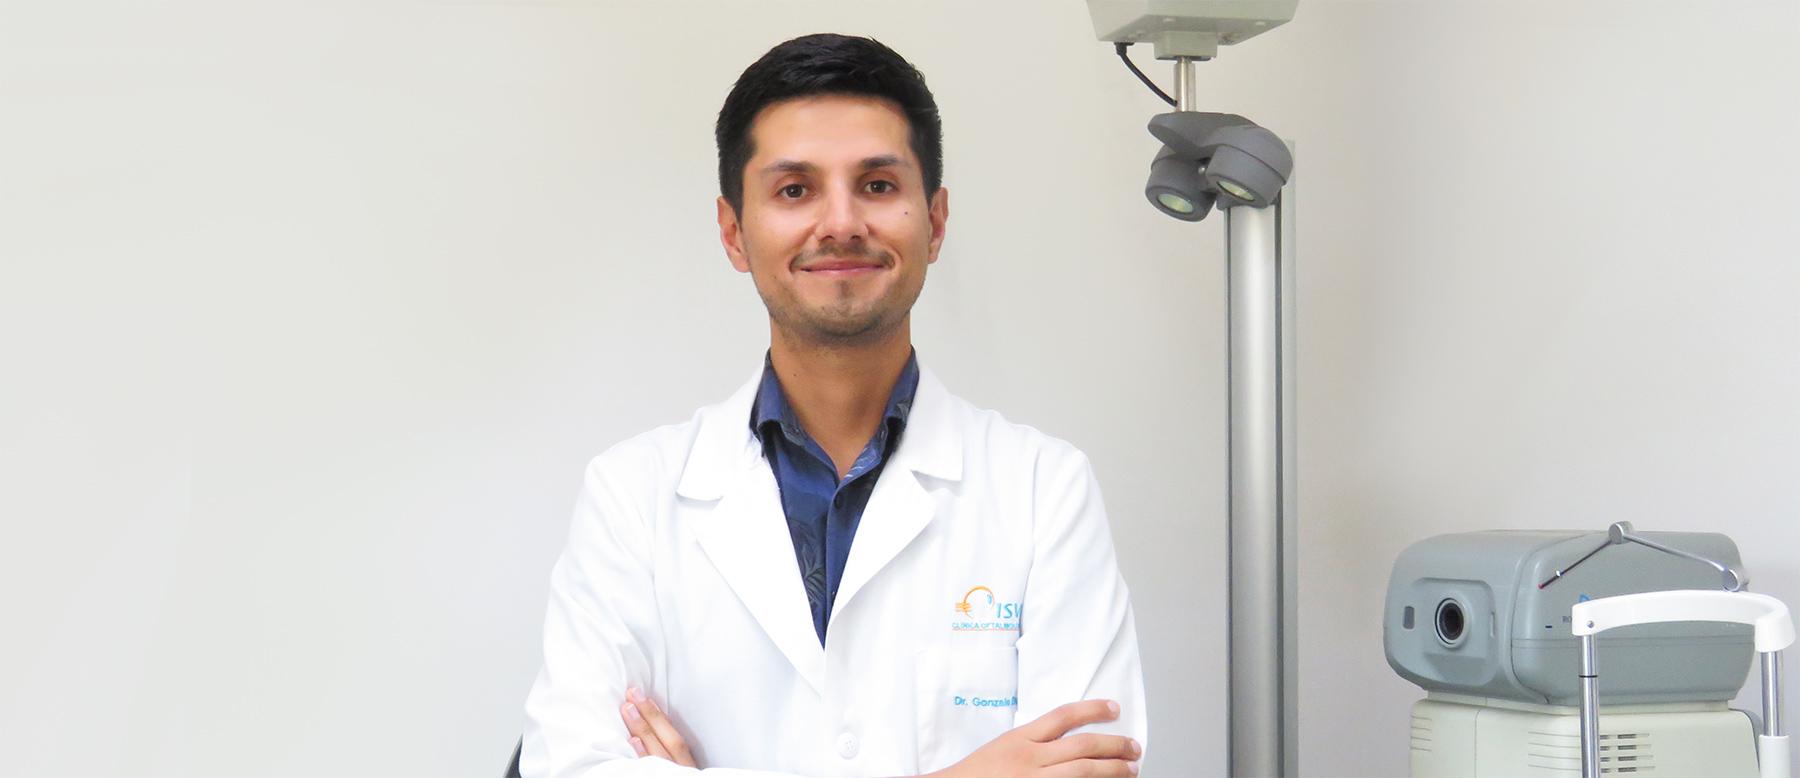 Dr. Gonzalo Duarte Oftalmólogo